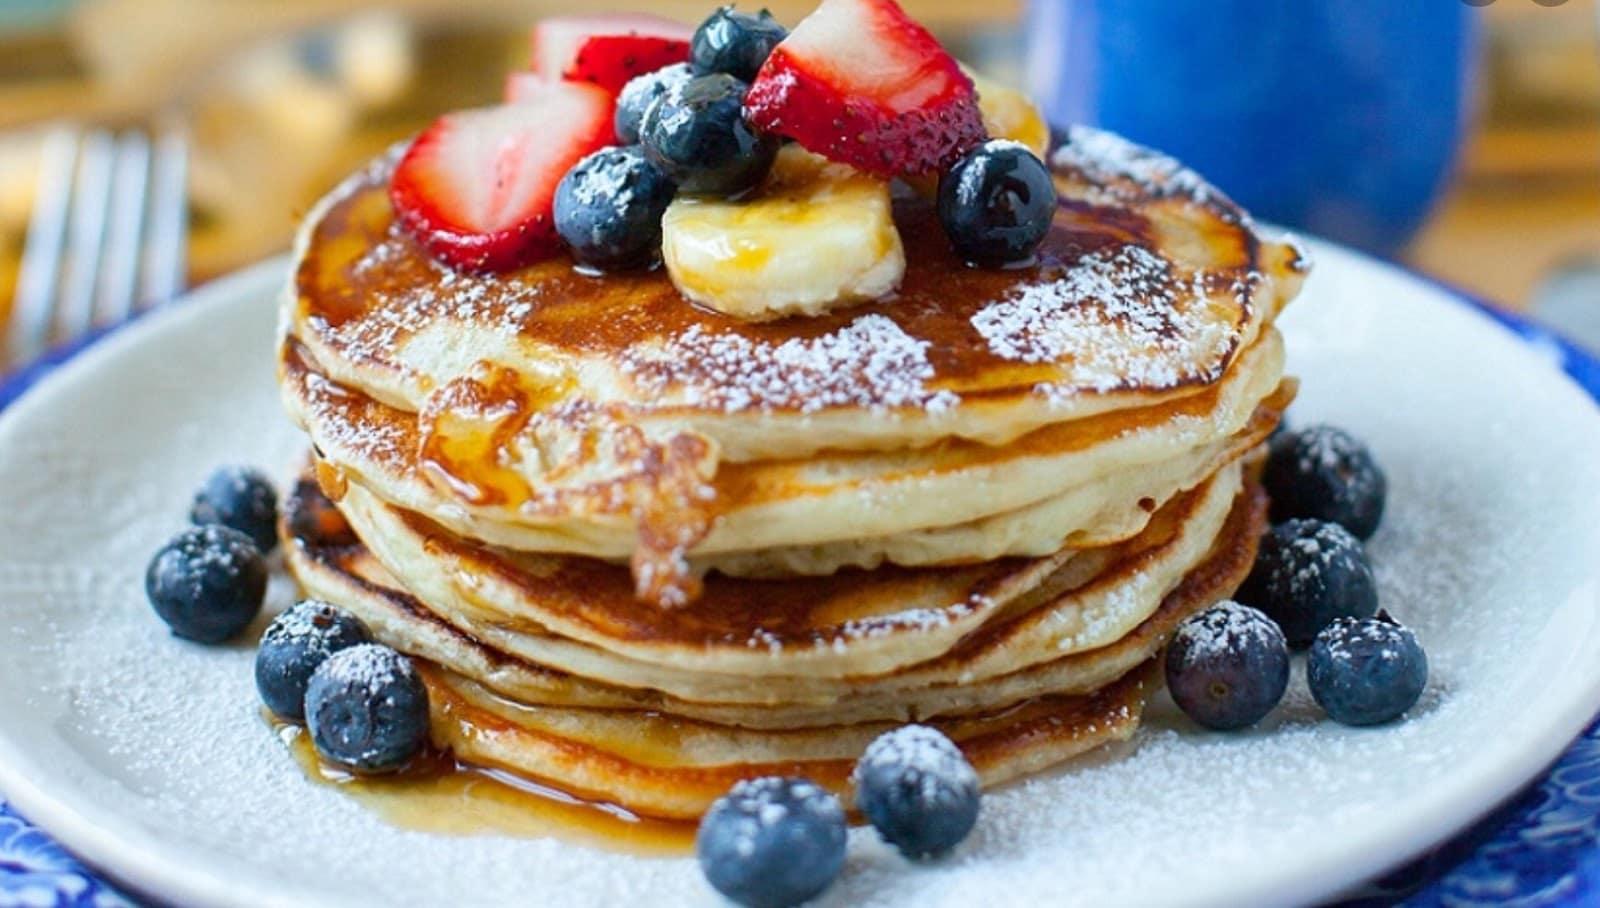 proteinpannkakor frukost med mycket protein